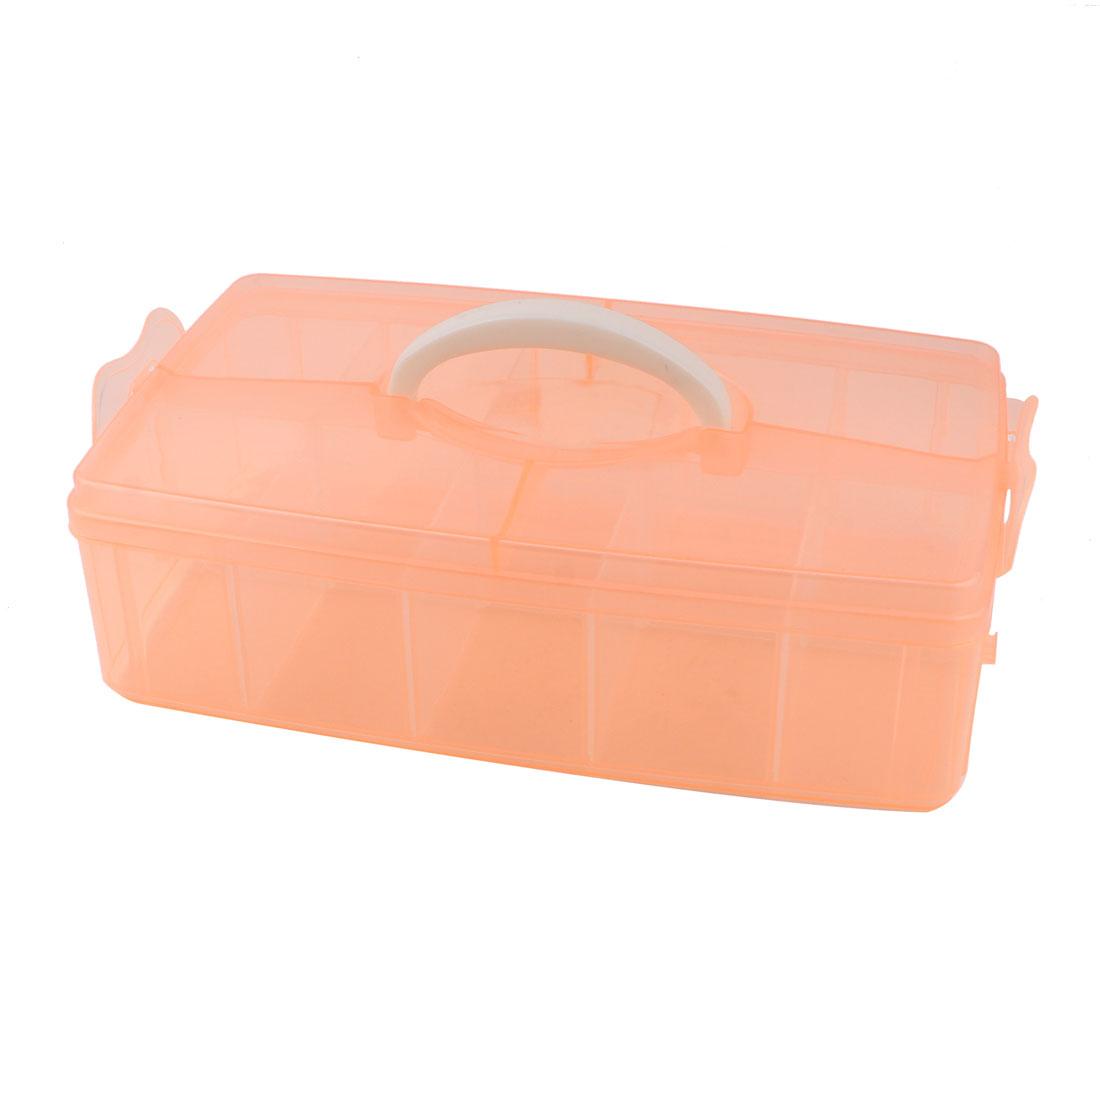 Apricot Plastic 10 Detachable Slots Components Necklace Jewelry Storage Case Box